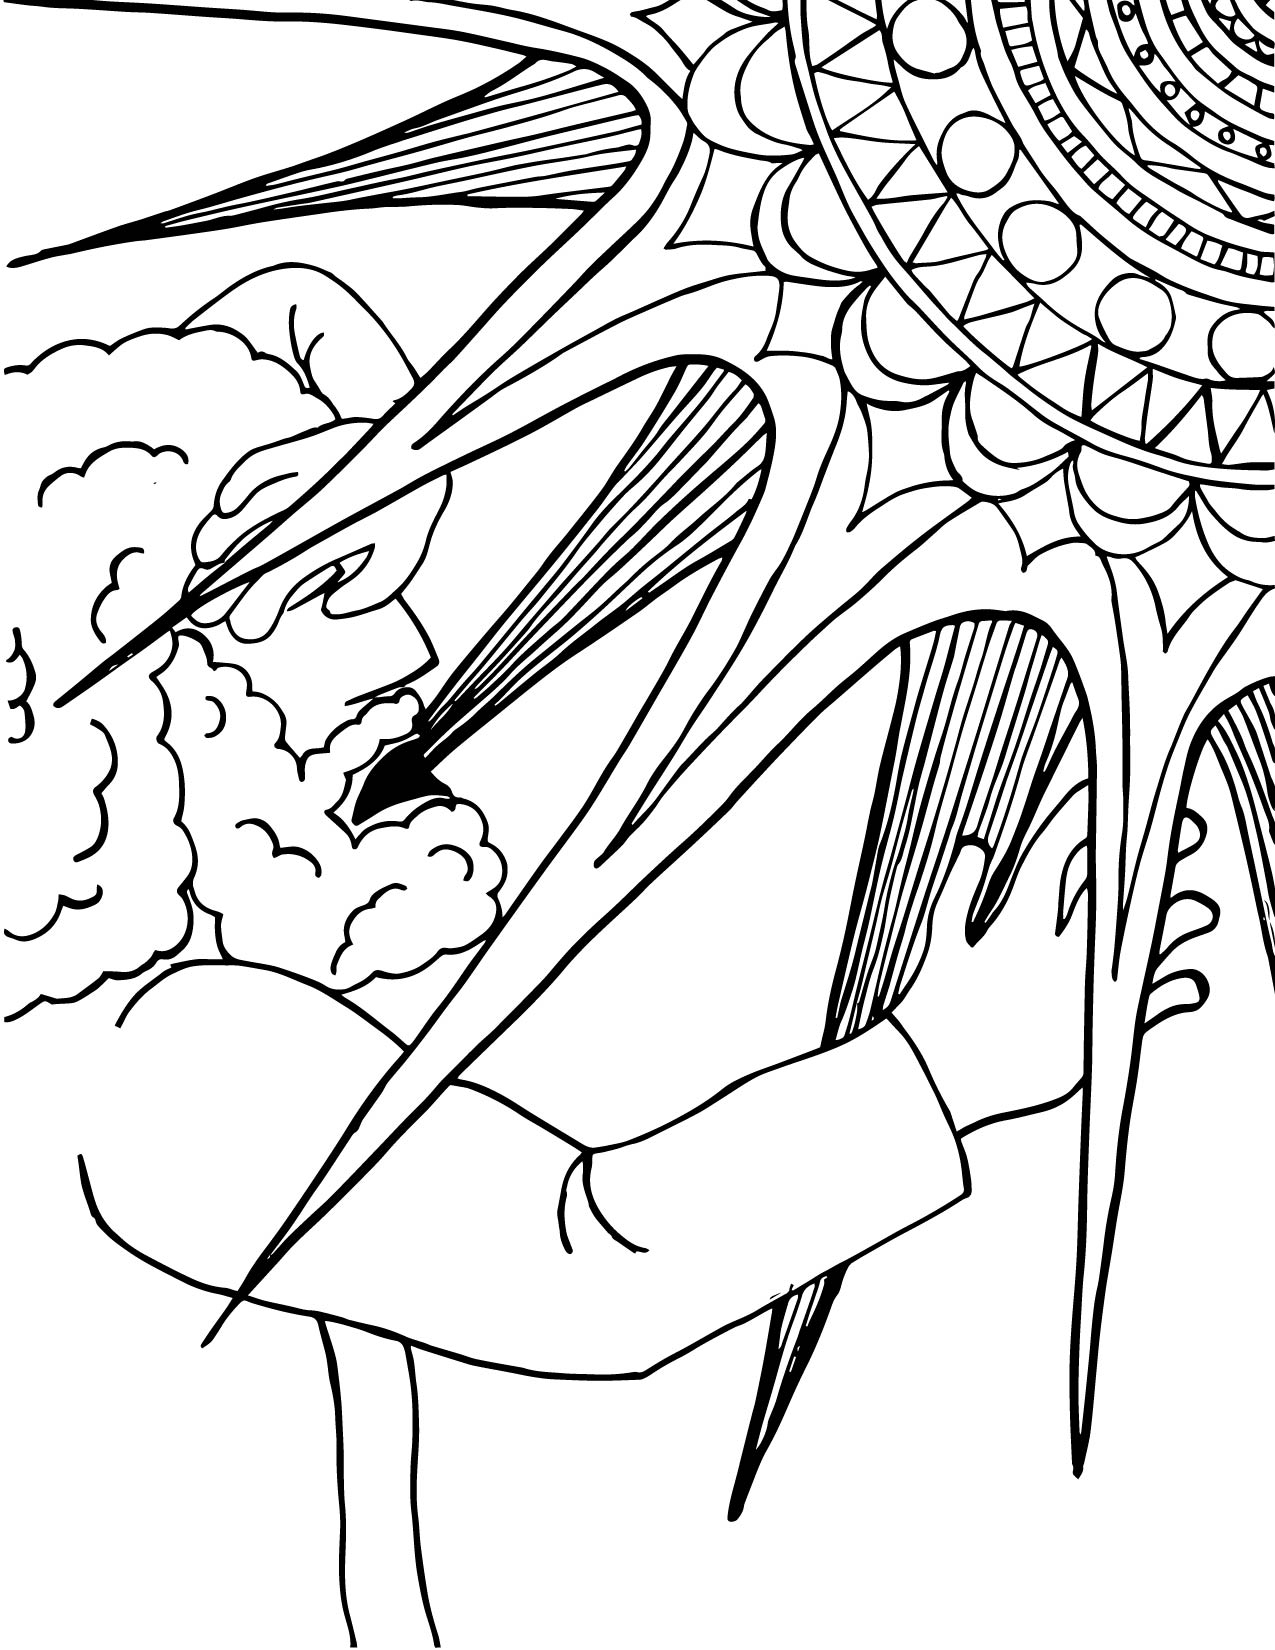 Conversion Of Saint Paul Coloring Page 01